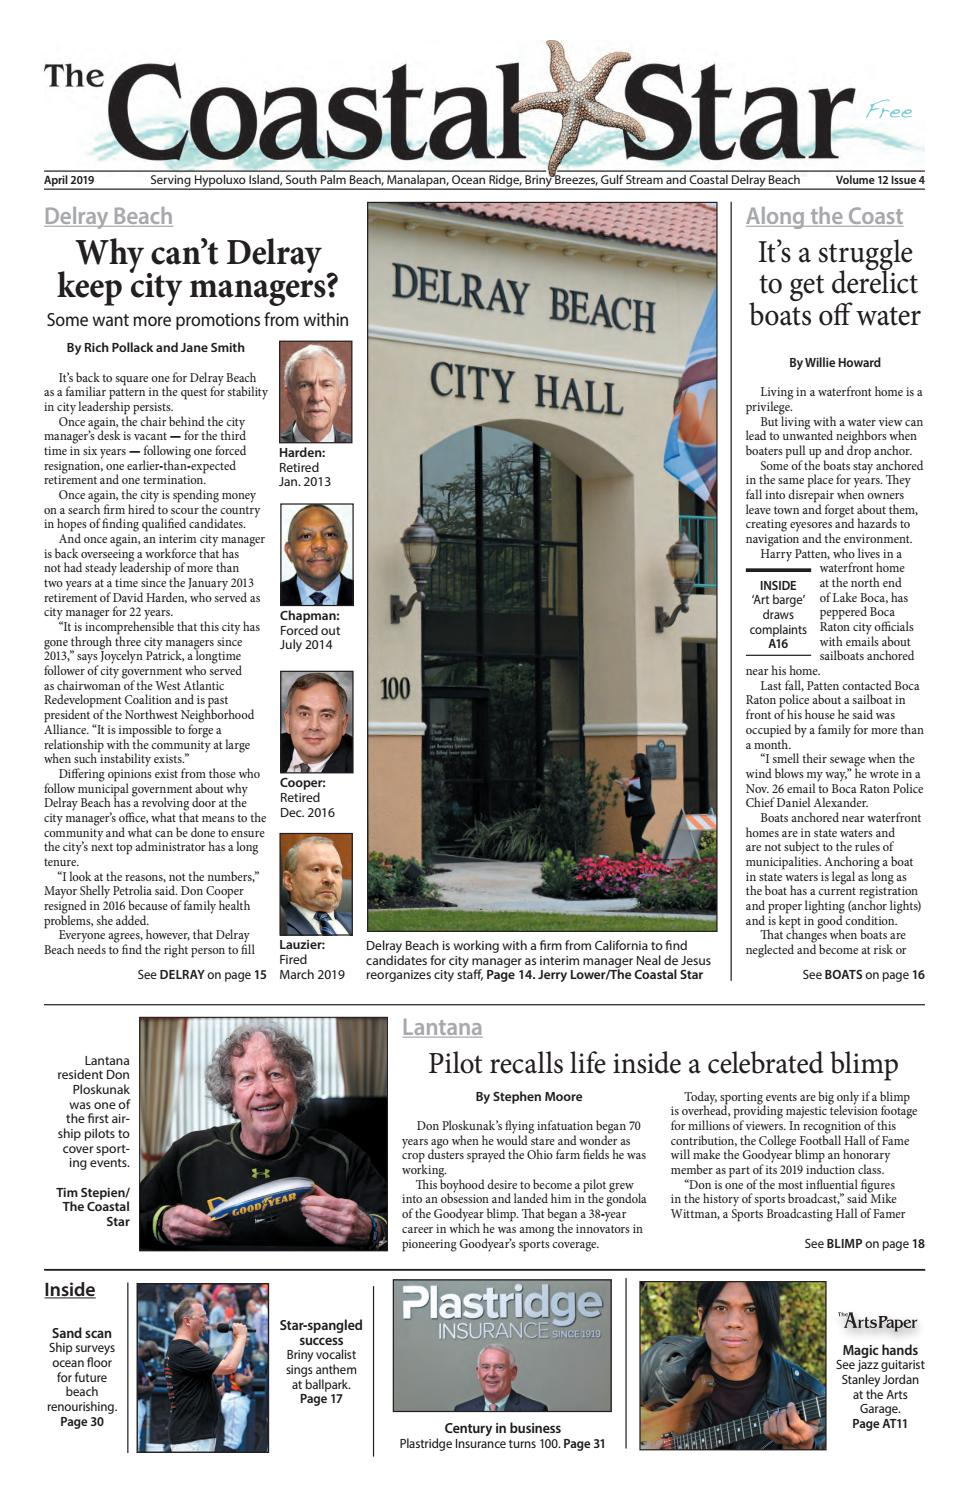 The Coastal Star April 2019 by The Coastal Star - issuu